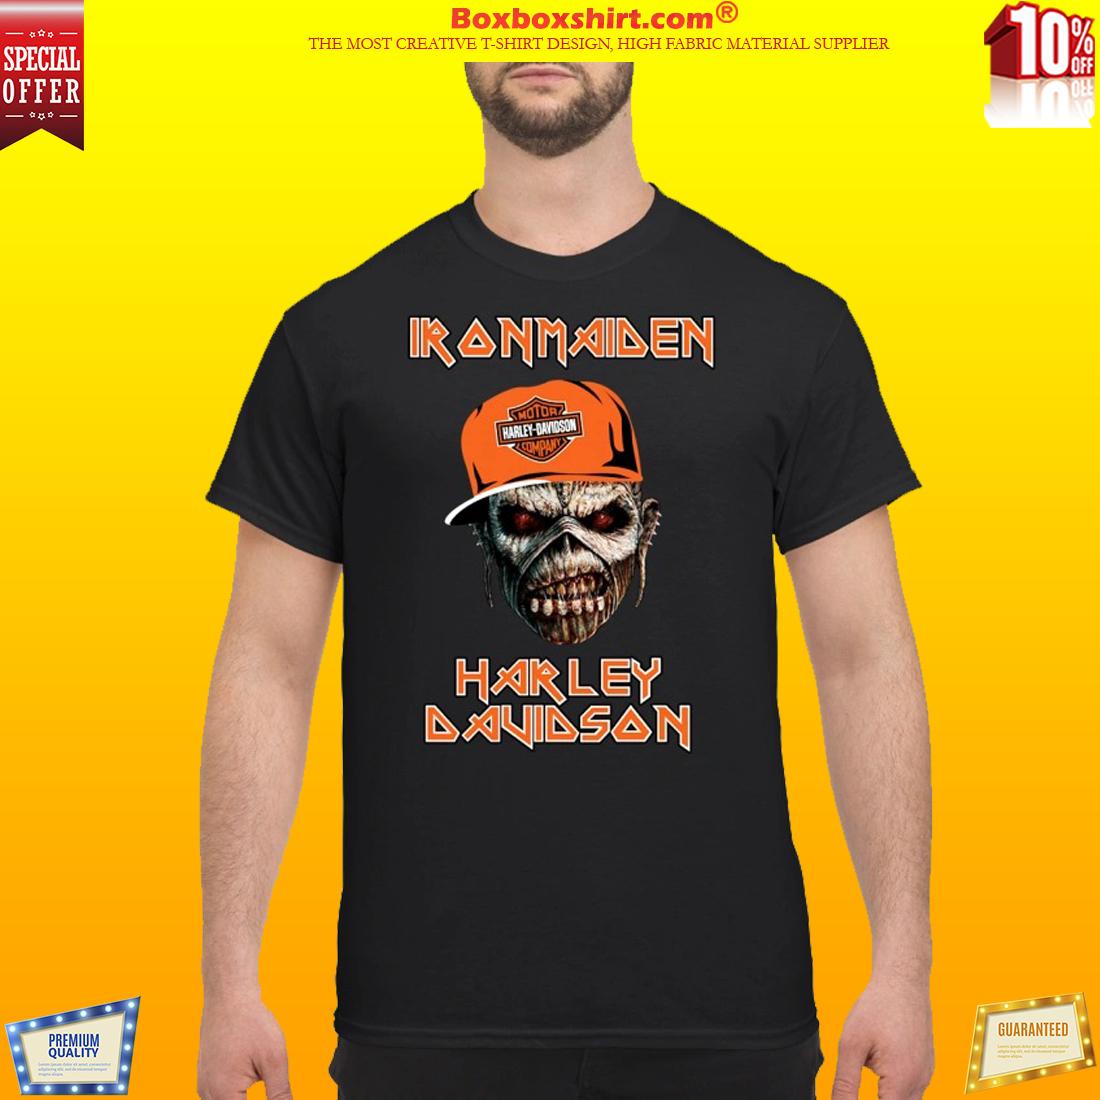 Iron maiden Harley Davidson skull t shirt